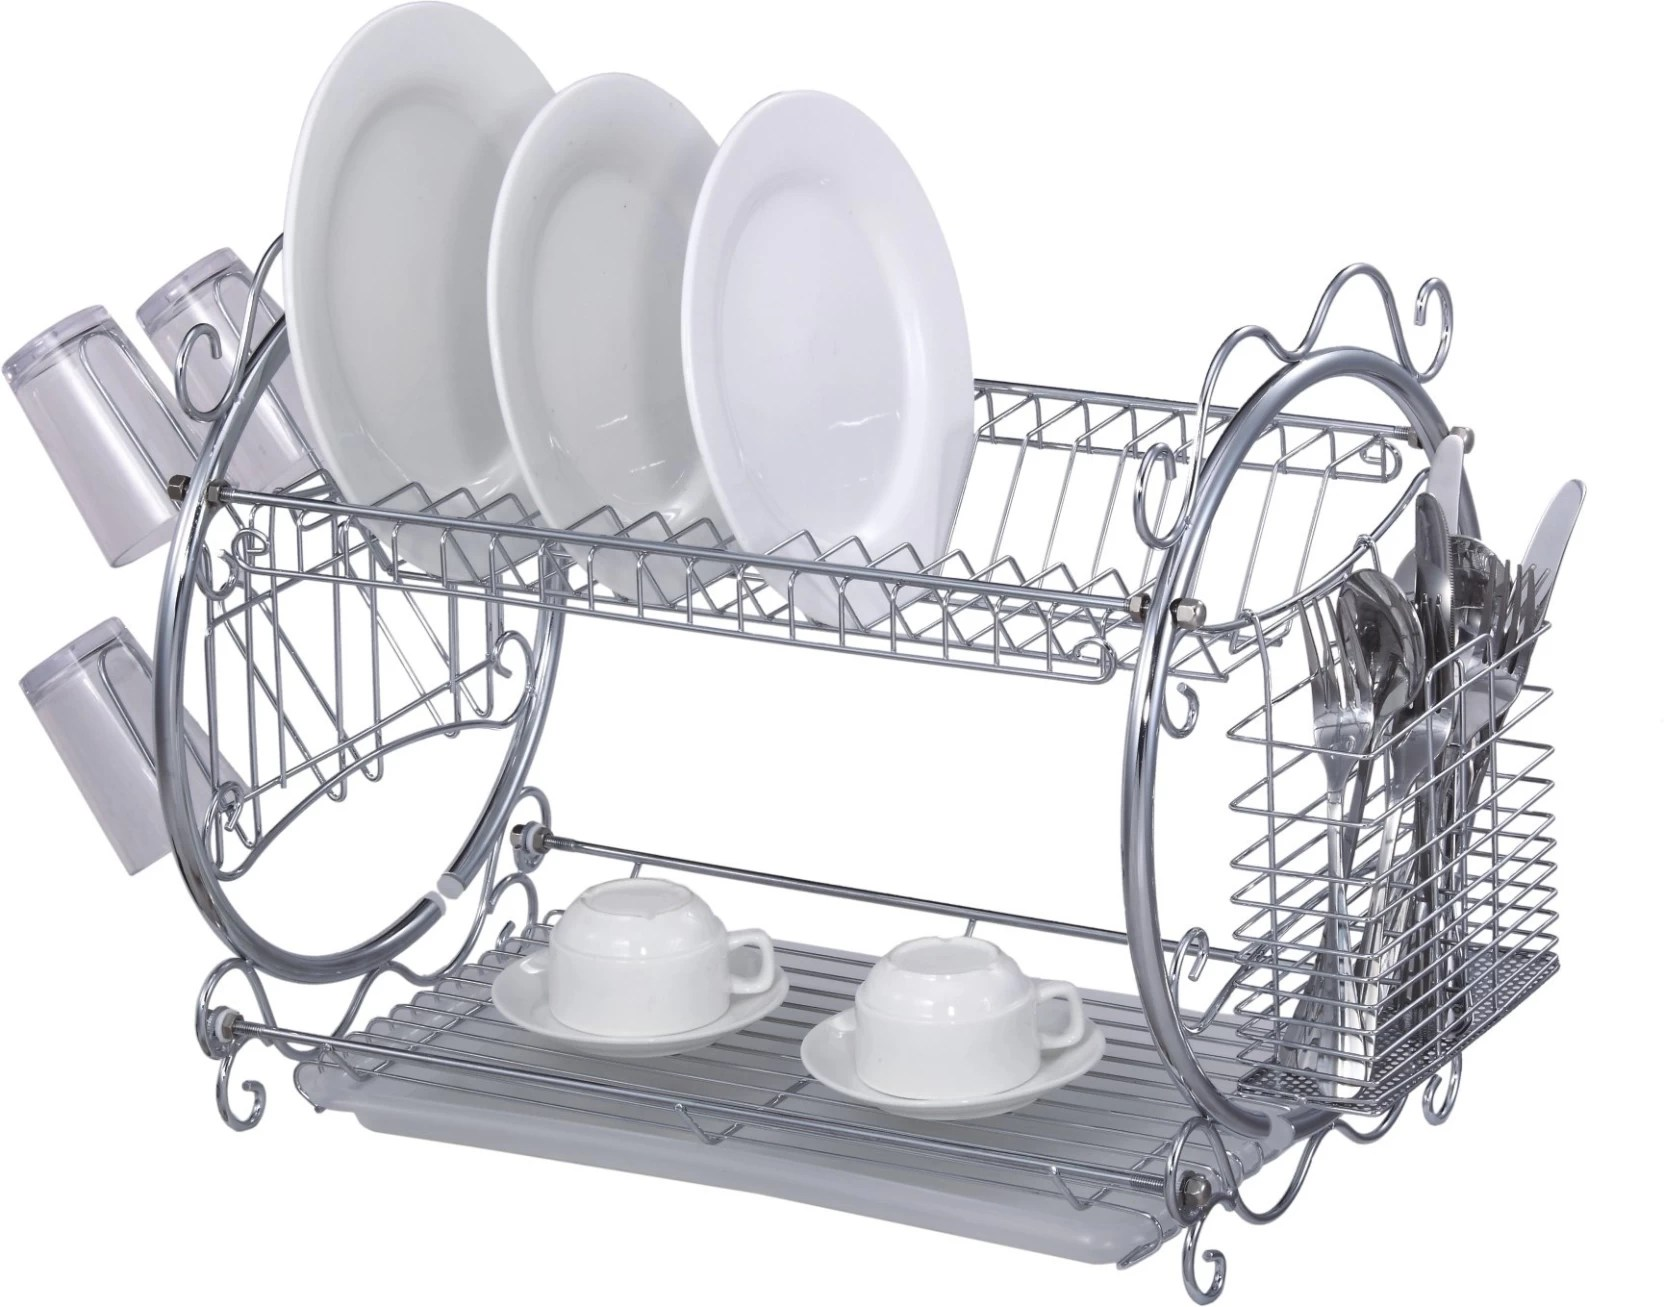 Seven Seas Spectra Dish Drainer Steel Kitchen Rack Price